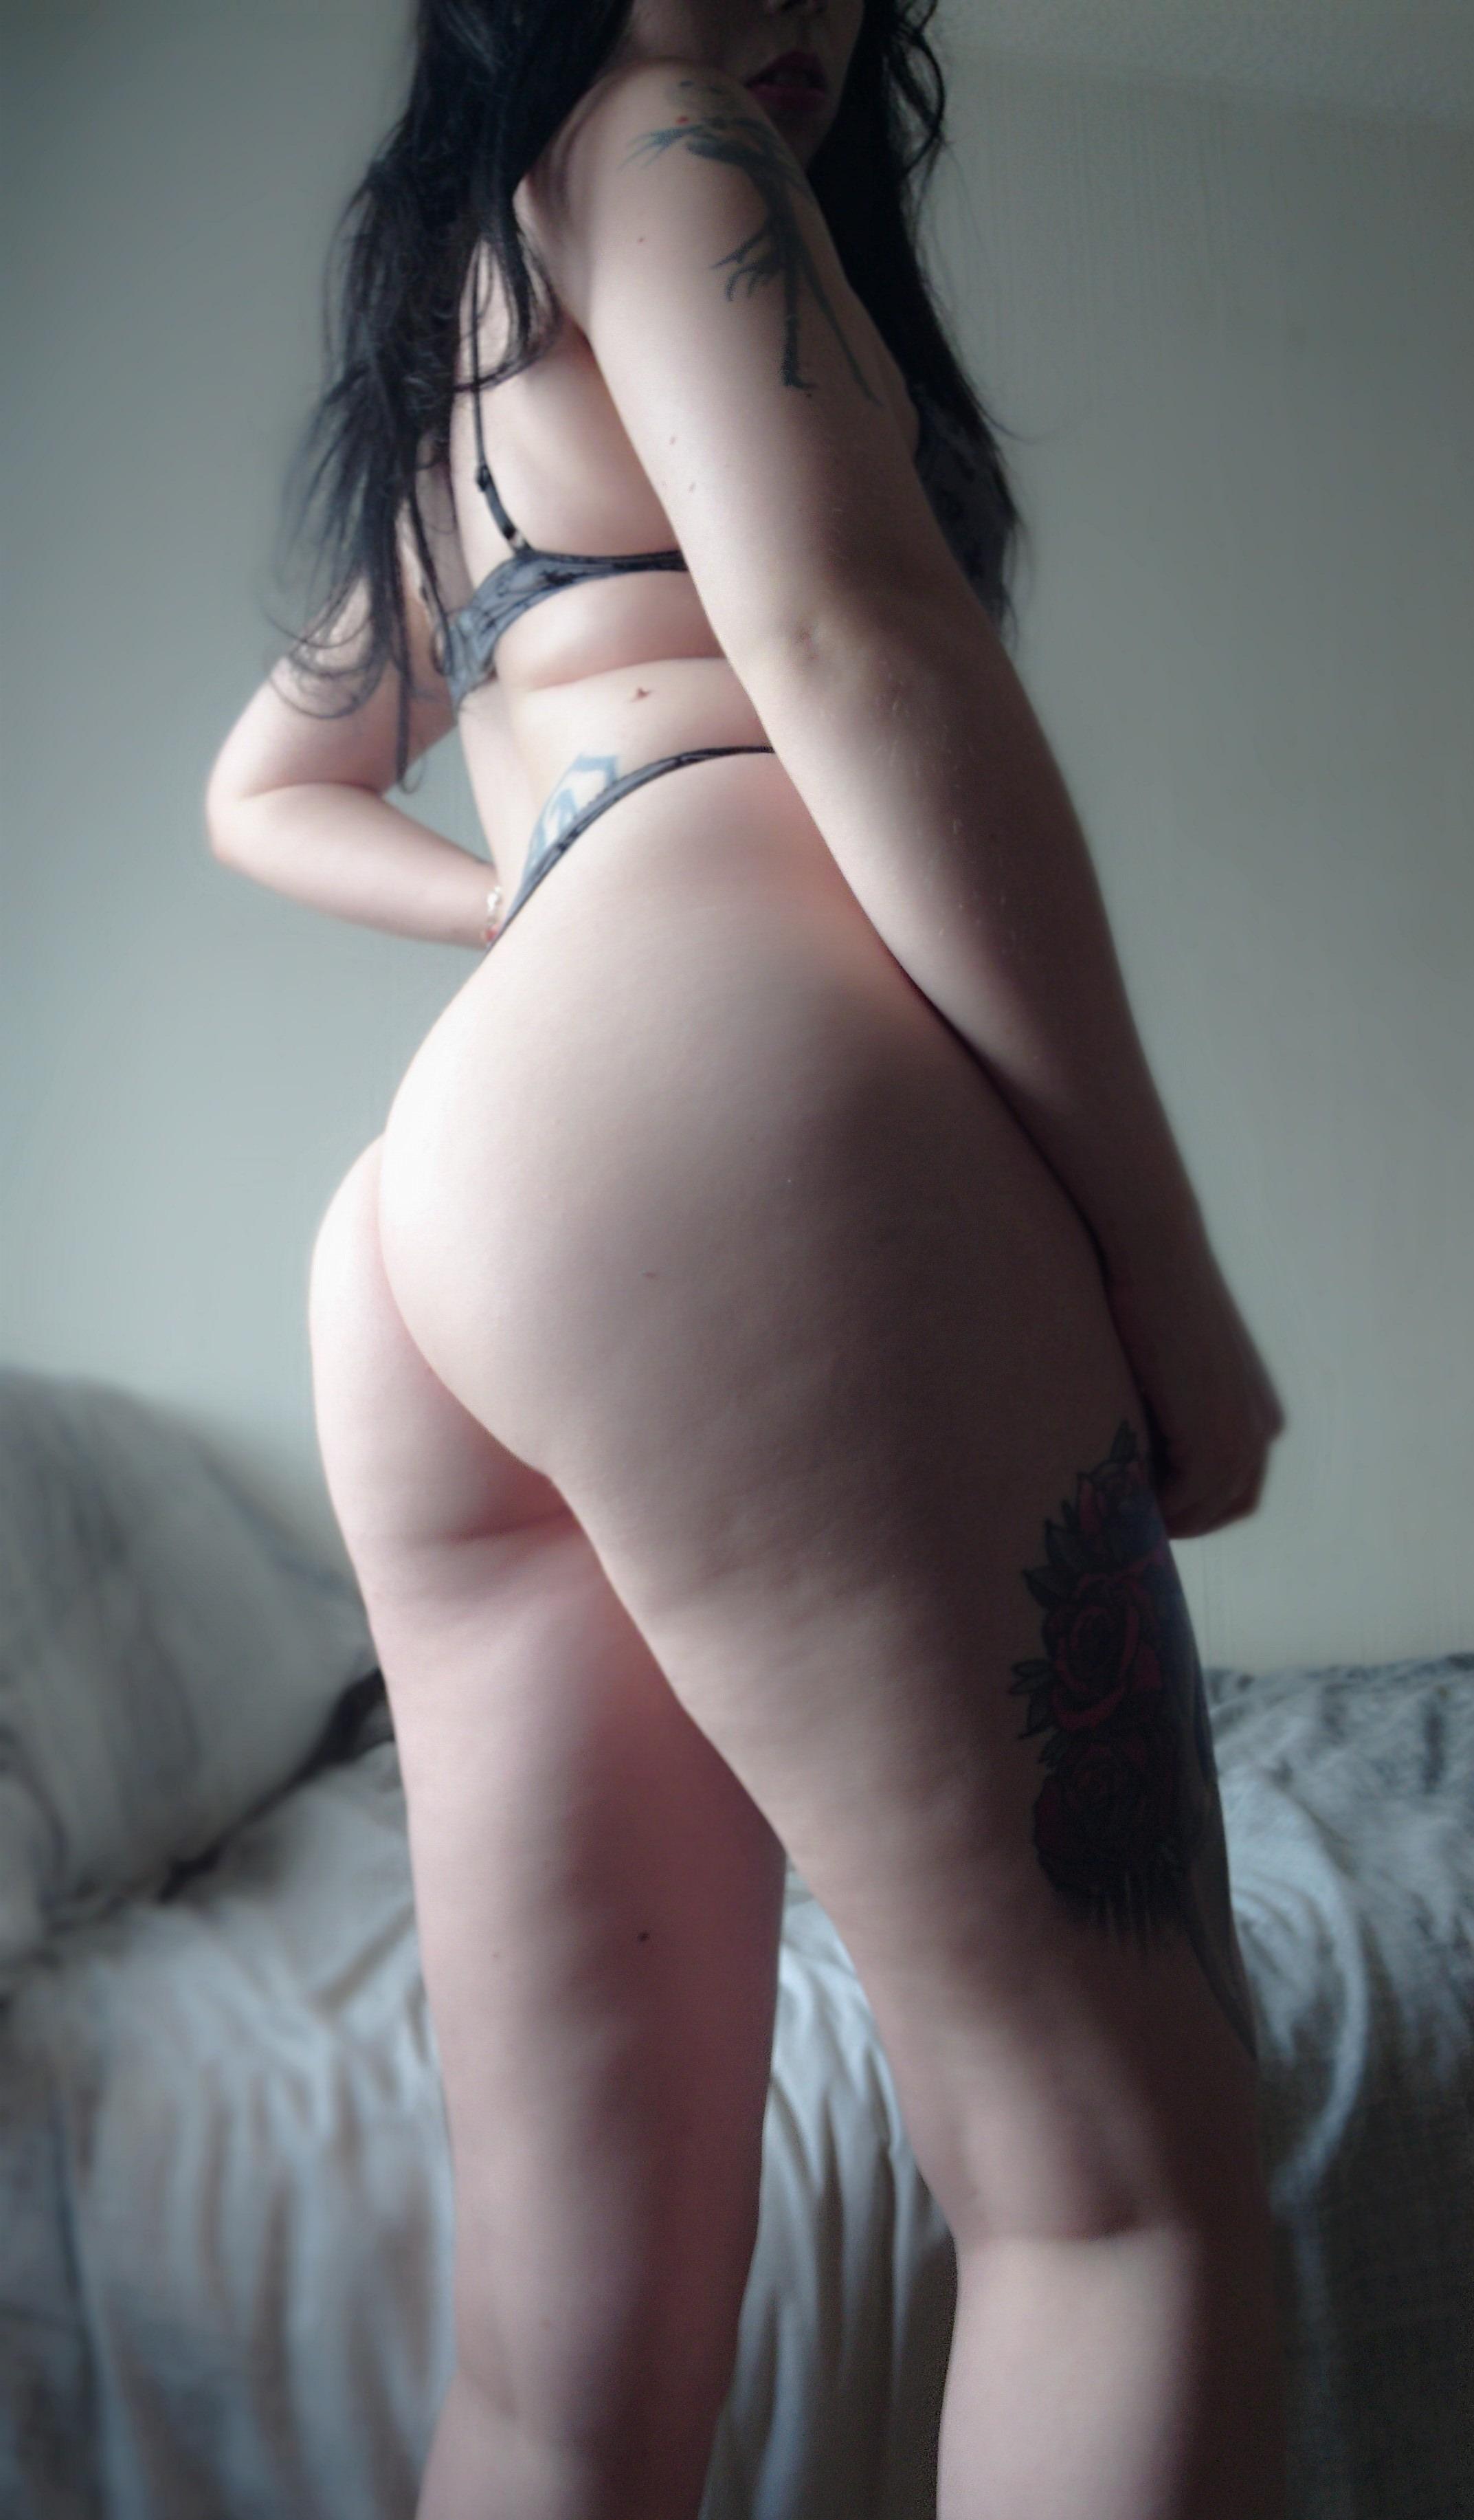 photoset image